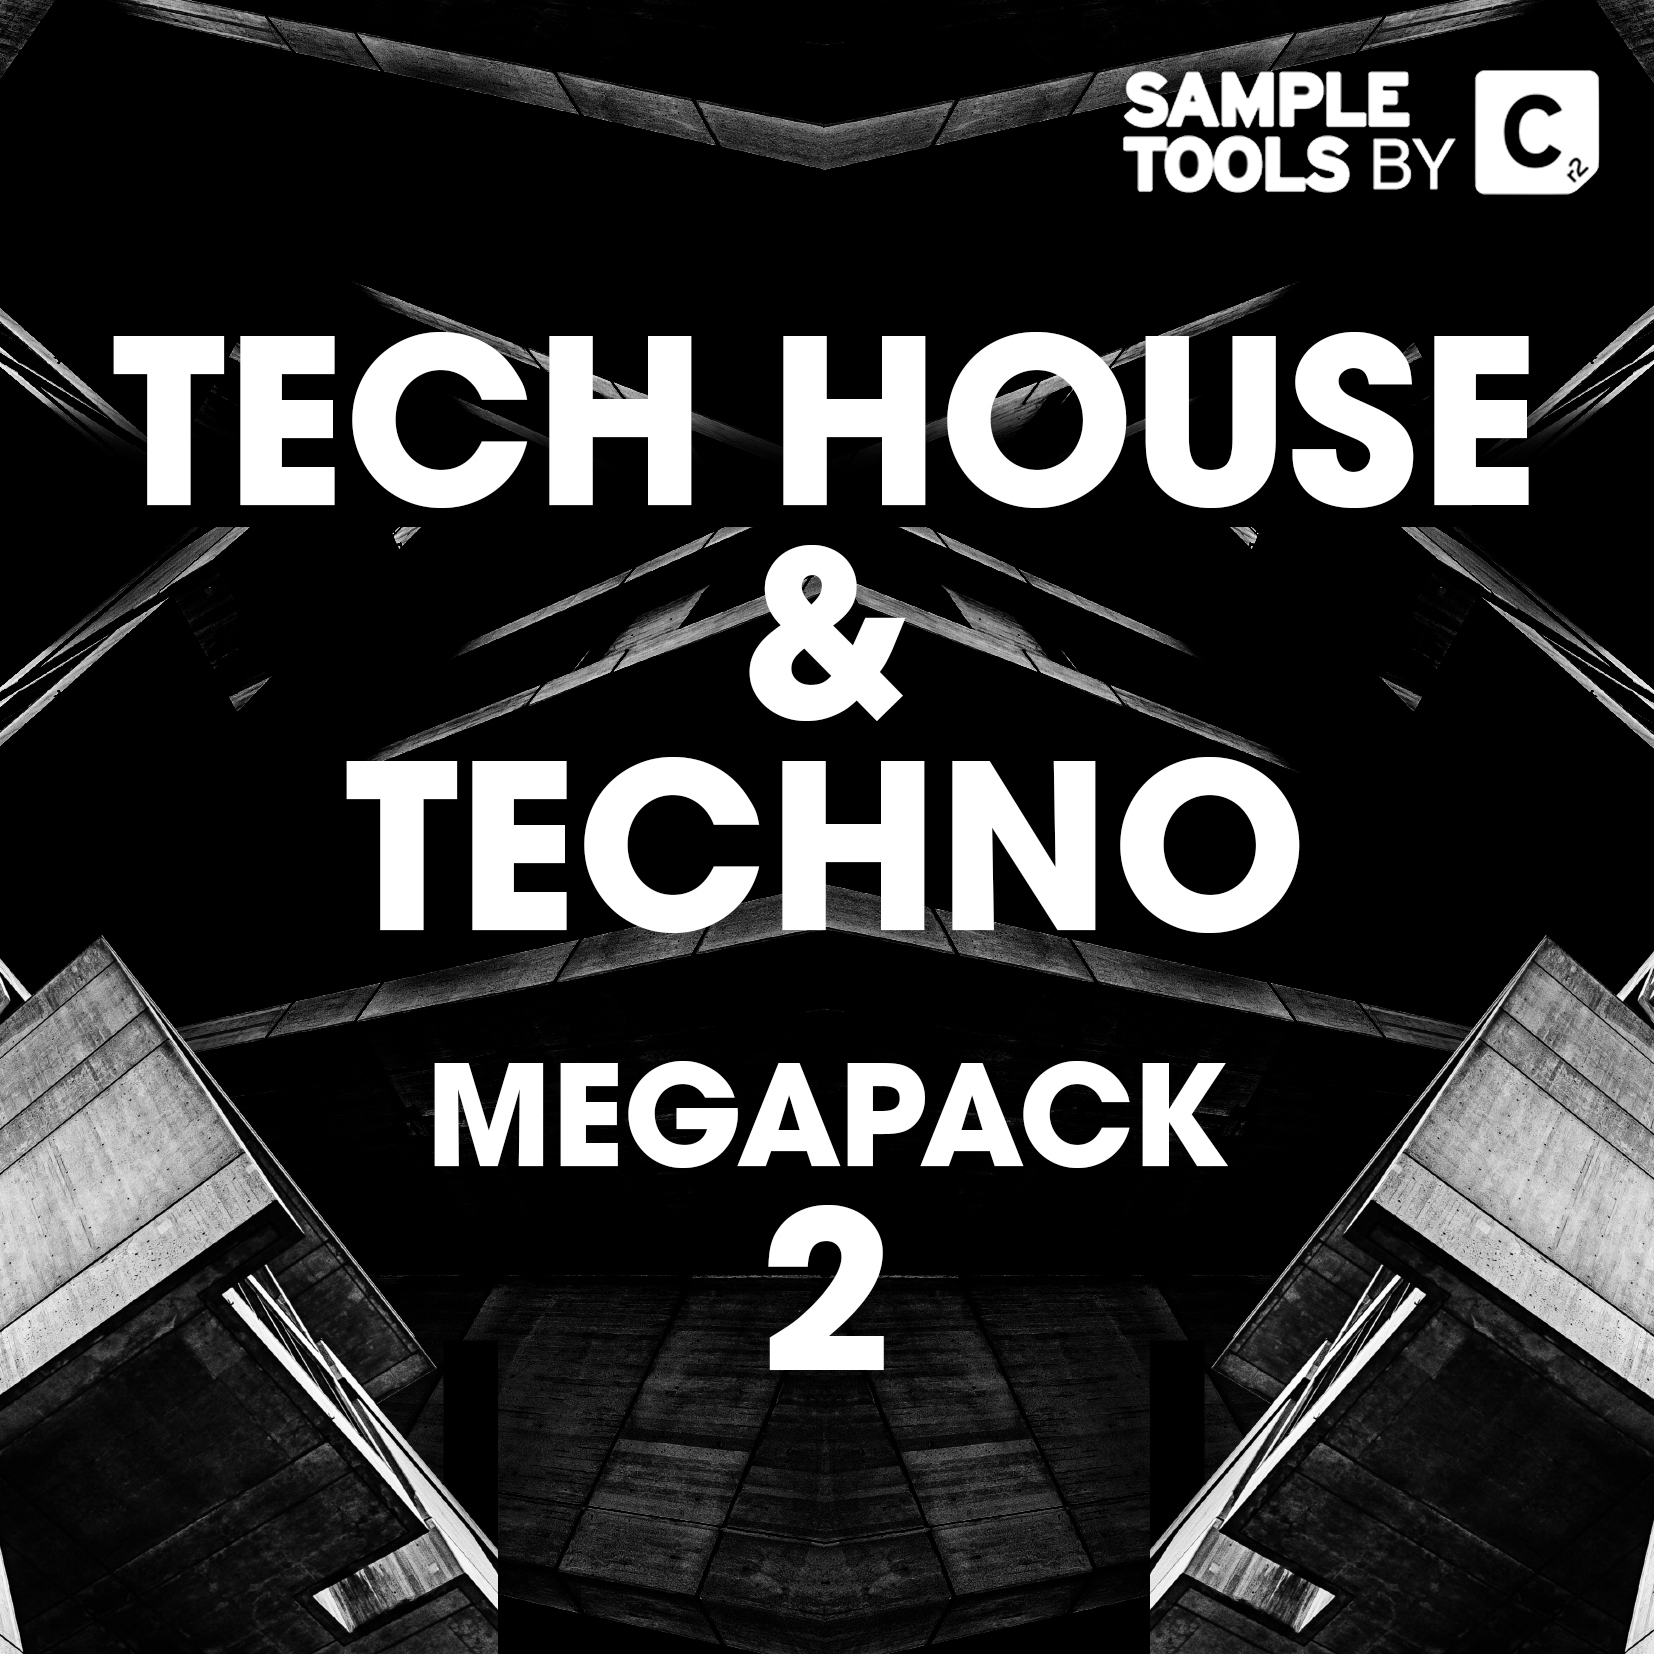 Tech House Techno Megapack Artwork